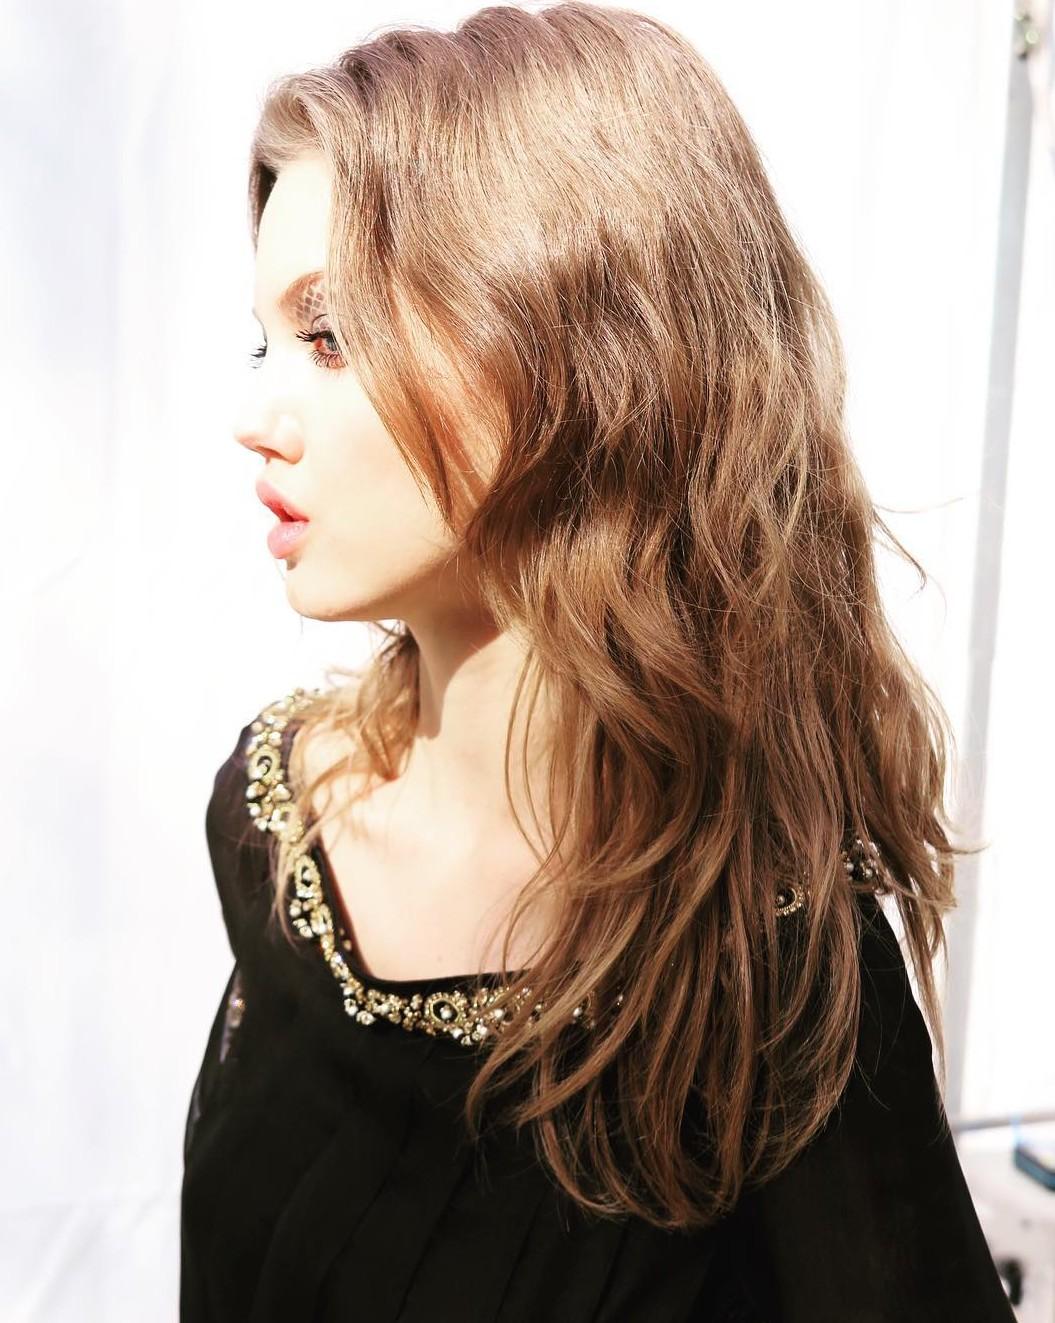 Chanel AW 2016 | Model: Lindsey Wixson | Hair: Sam McKnight |